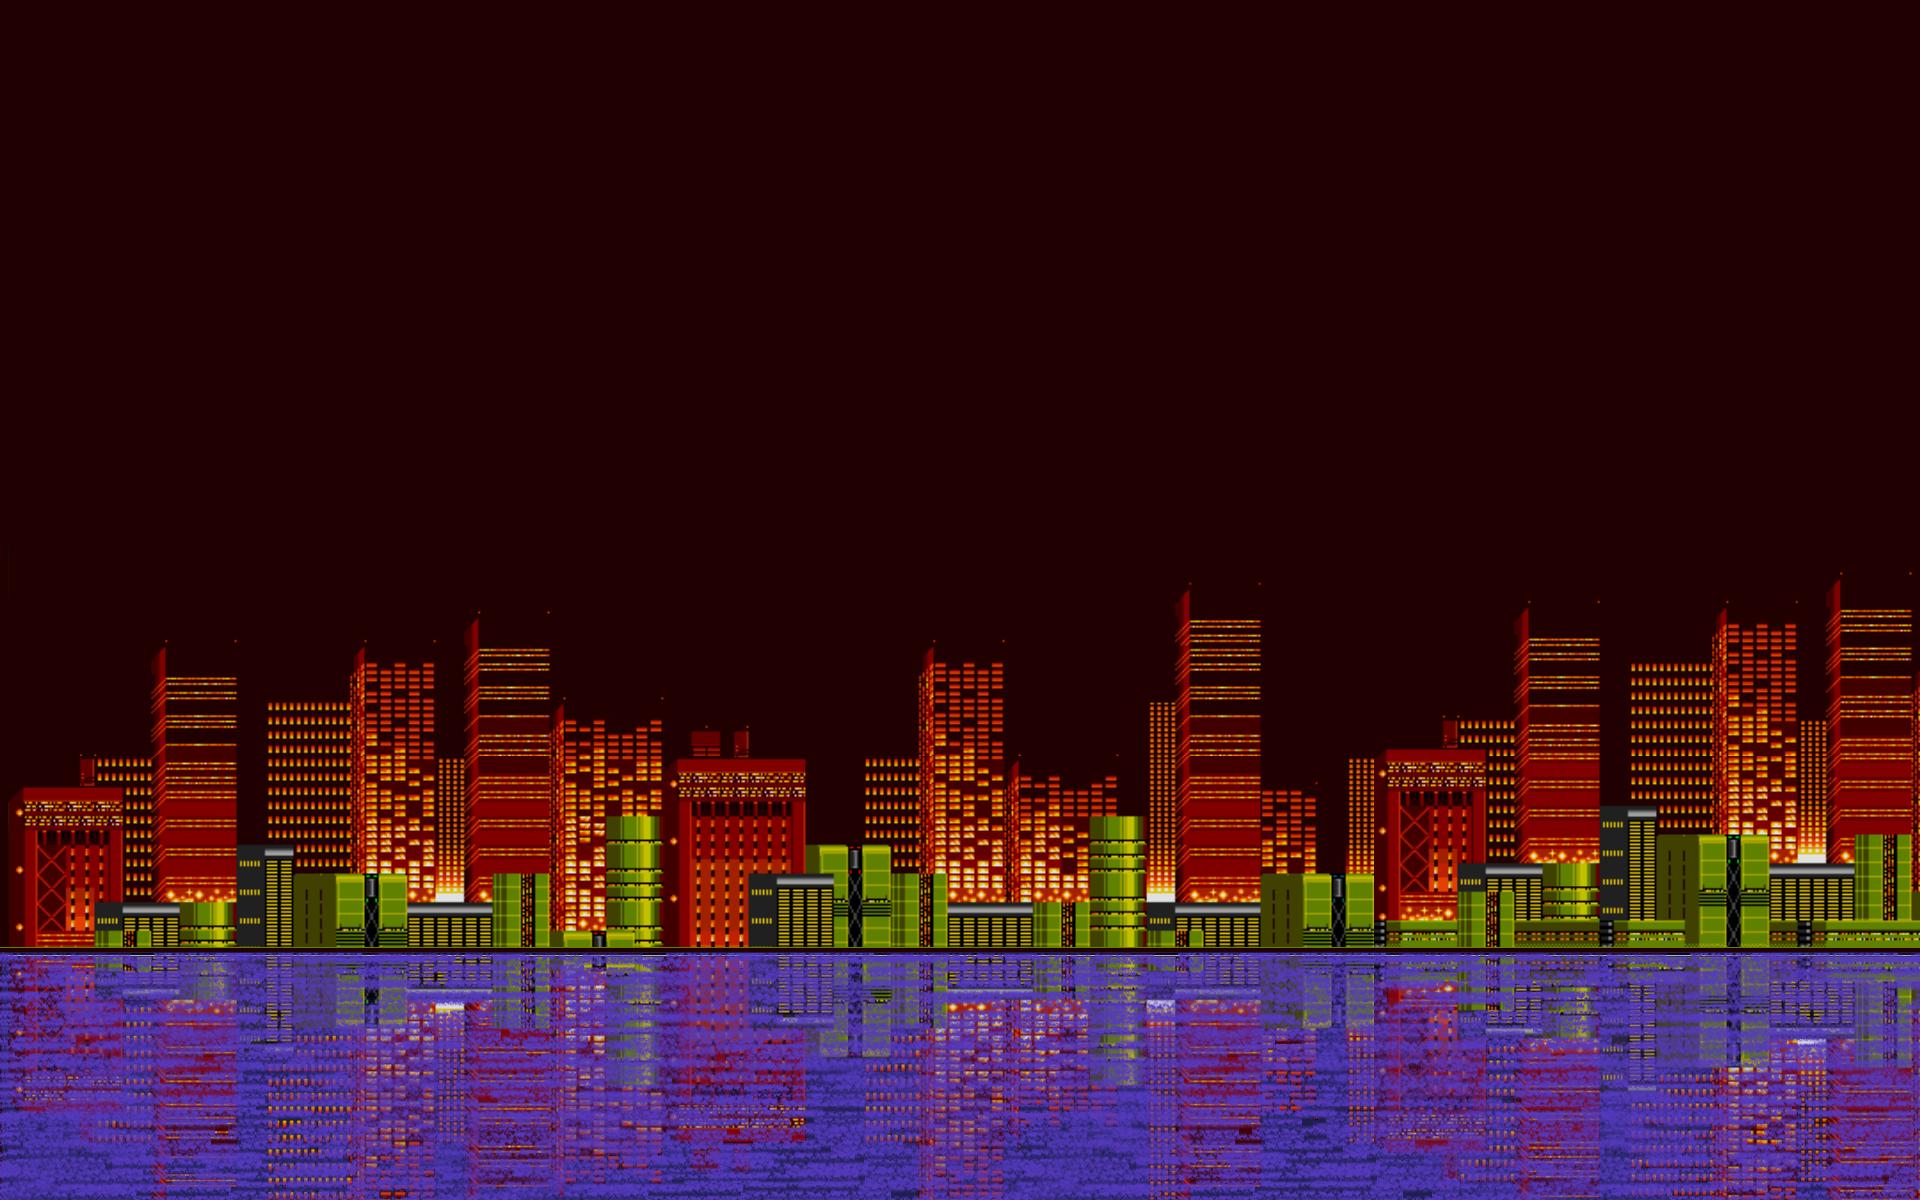 Android Wallpaper 8 Bit Landscapes